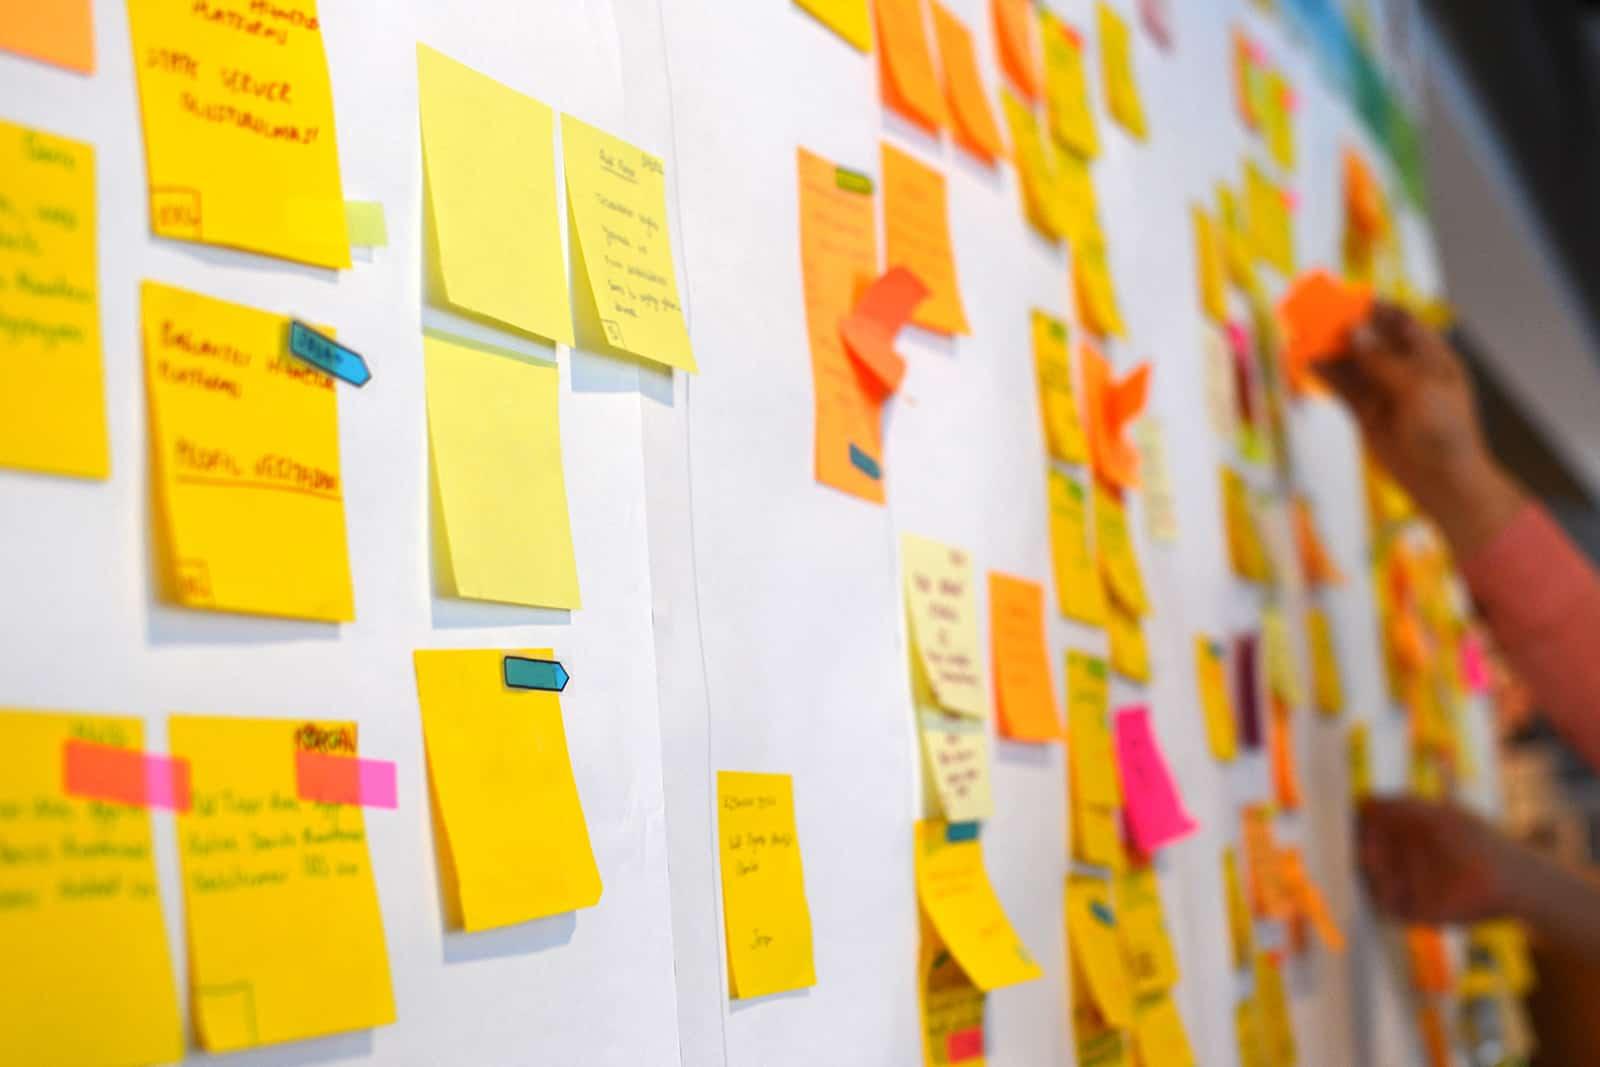 Kanban Board, is one of the prerequisites of agile working methodology